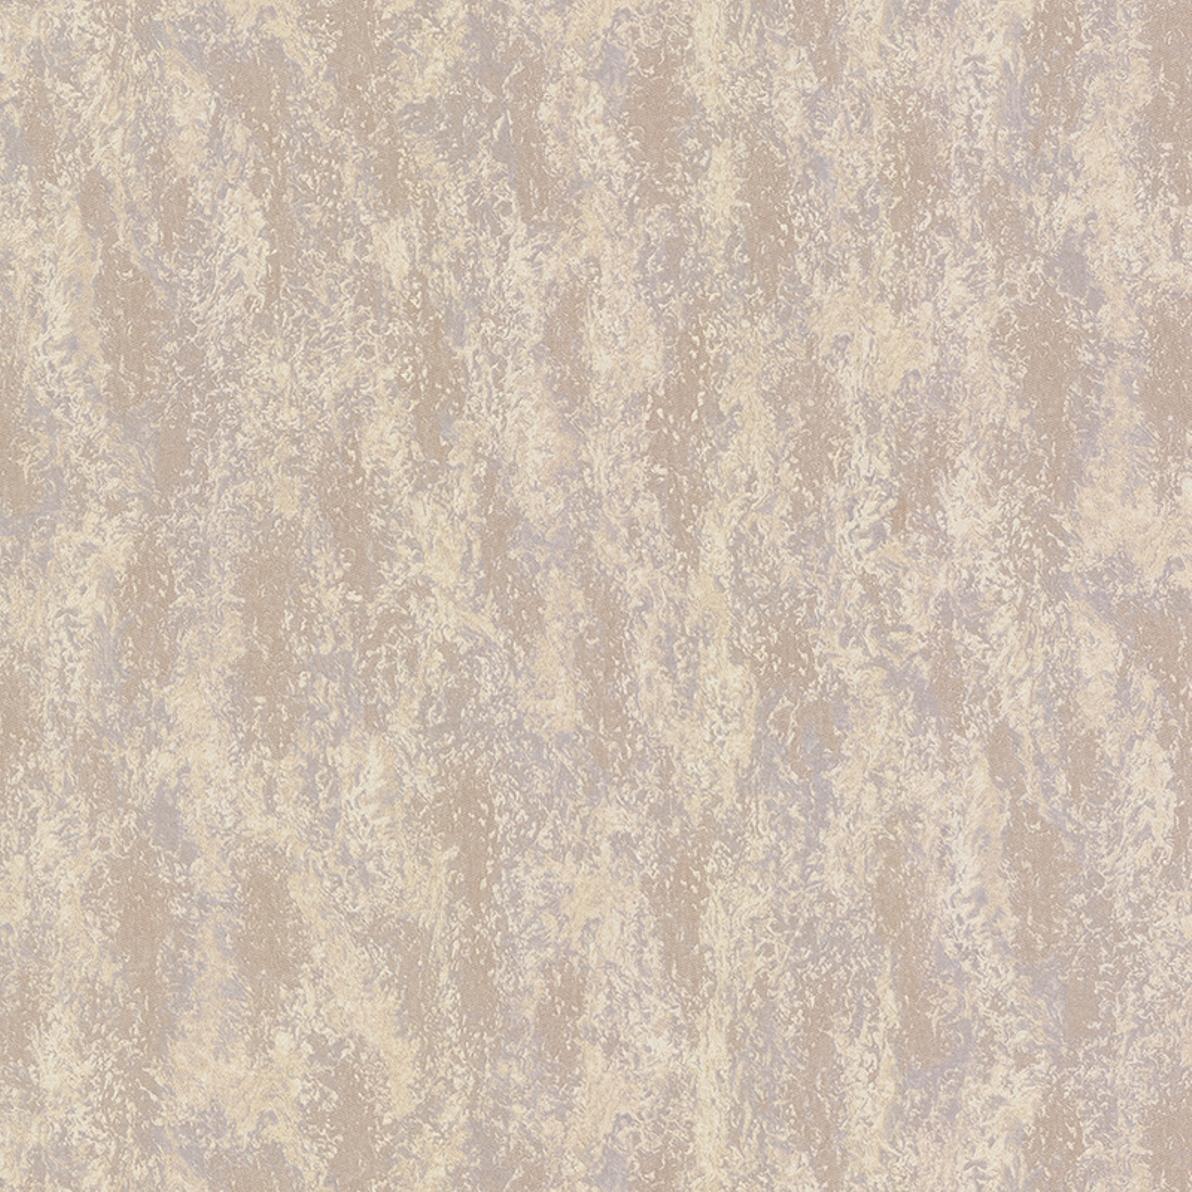 Обои Decori & Decori Bukhara 82794